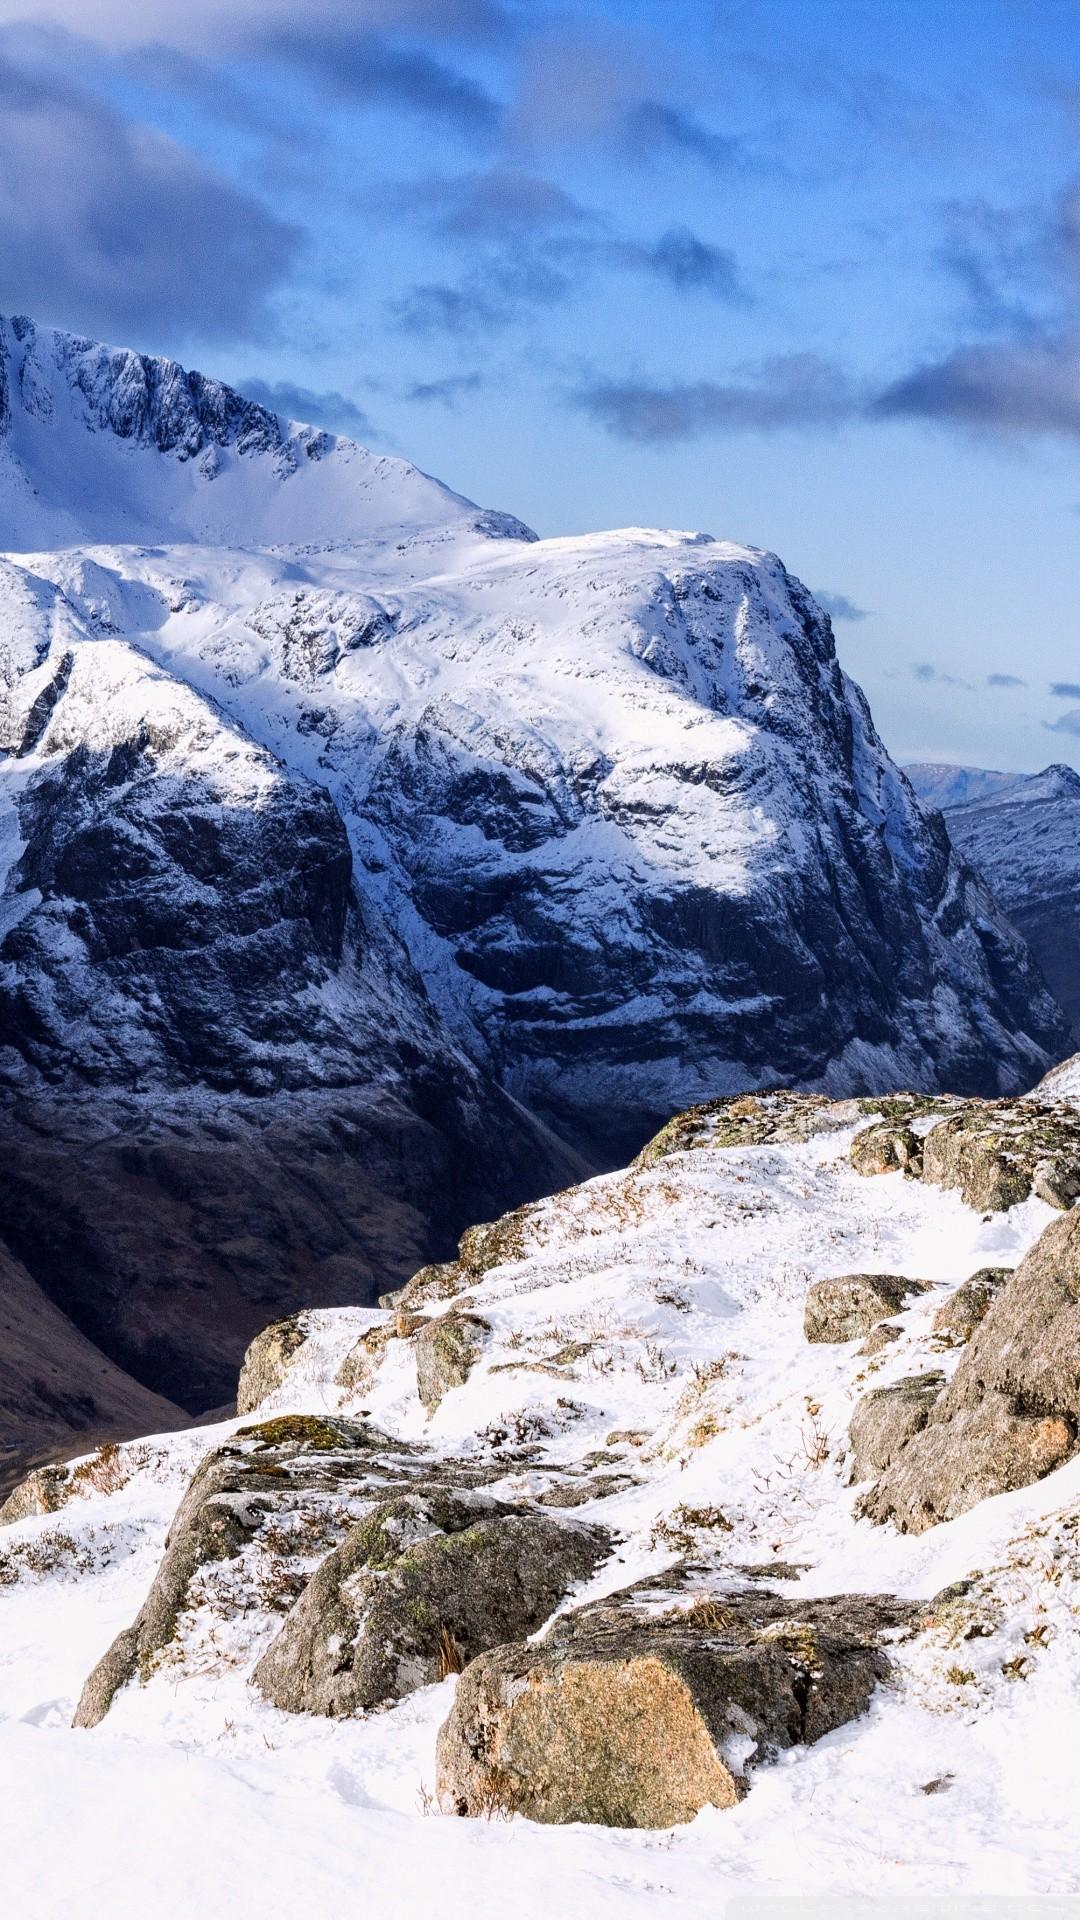 Free The Three Sisters, Scotland phone wallpaper by jham1